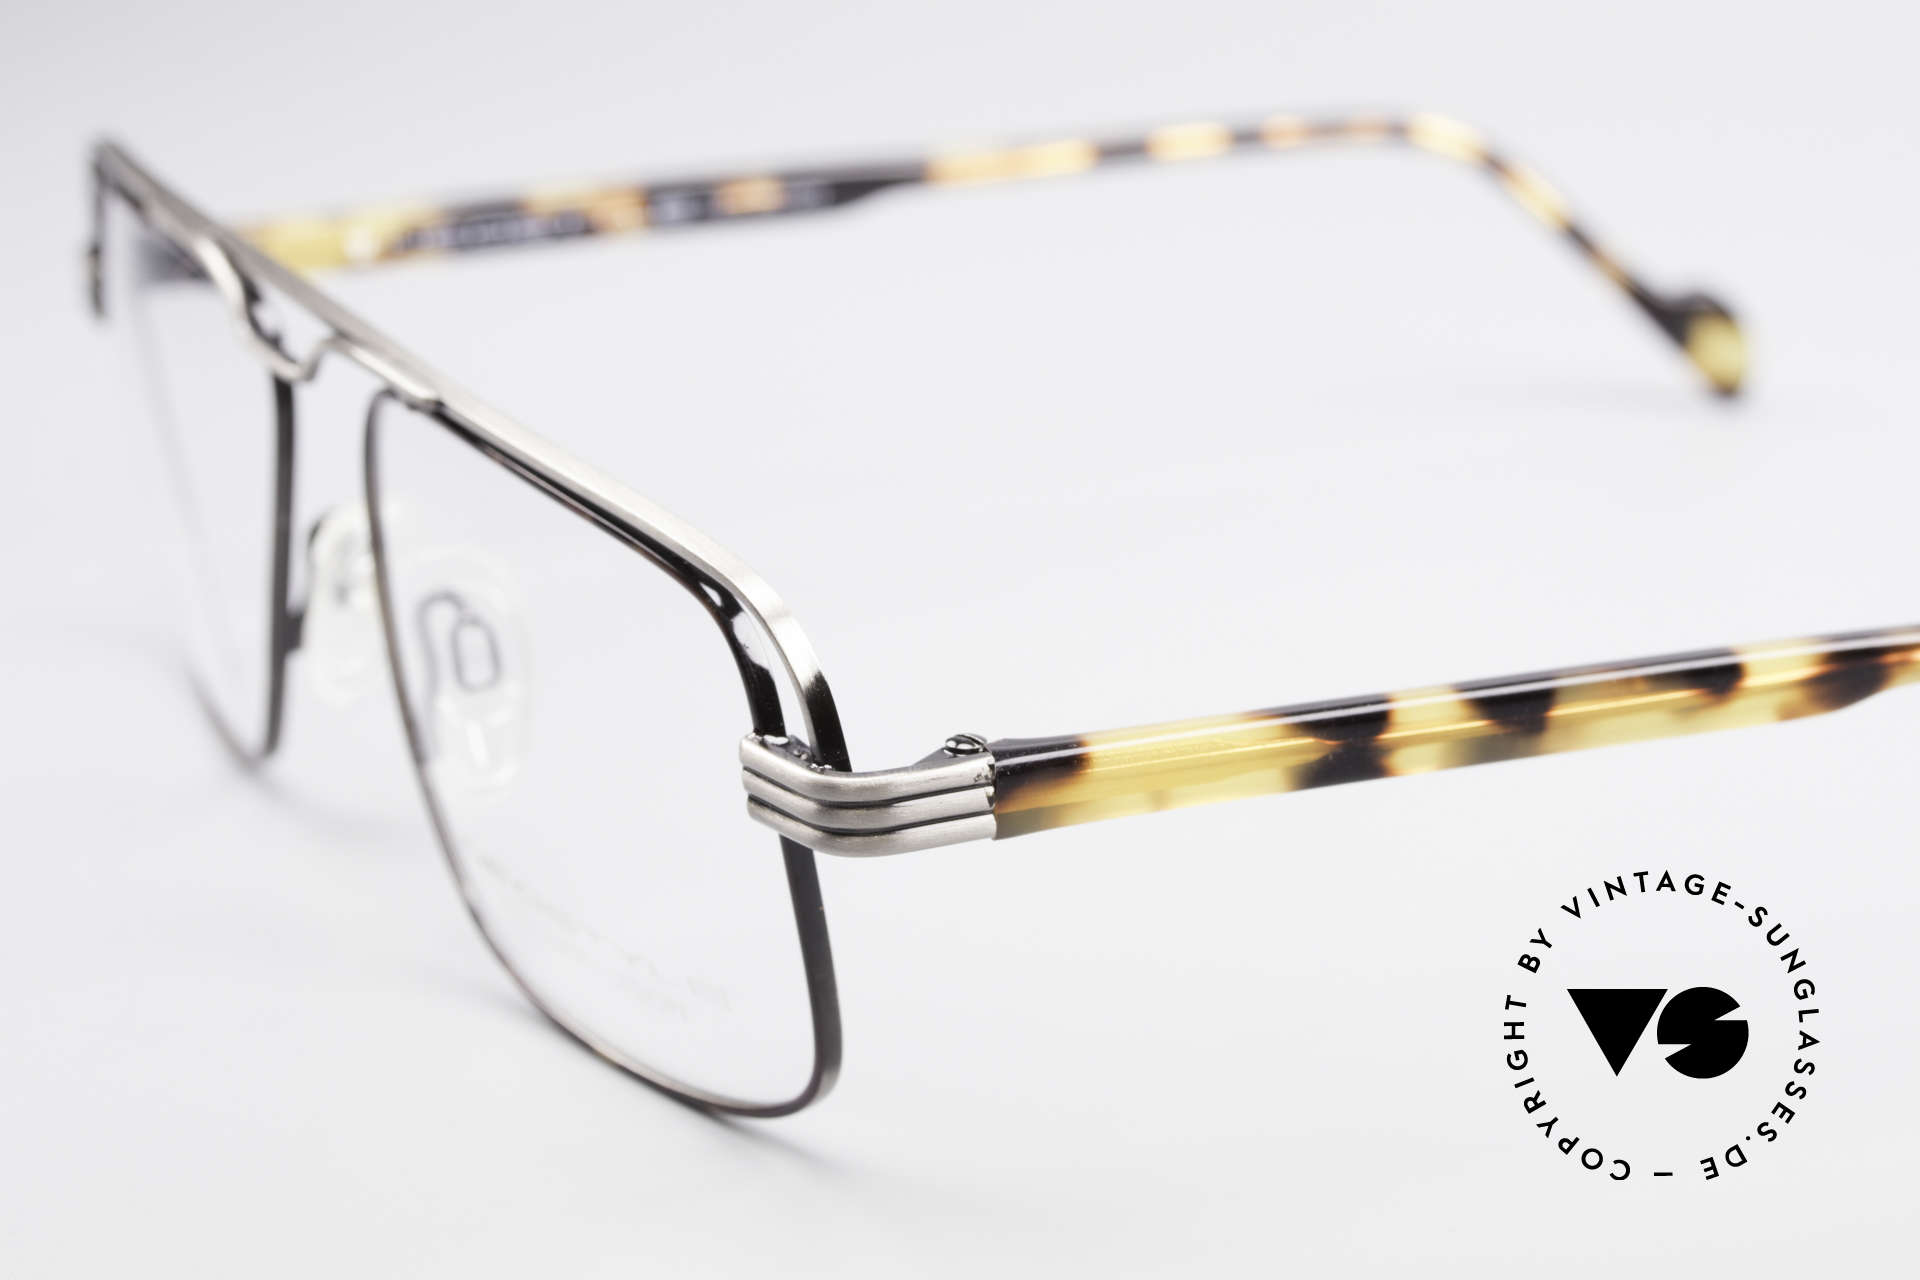 Neostyle Jet 230 80's Vintage No Retro Glasses, frame fits optical lenses or sun lenses of any kind, Made for Men